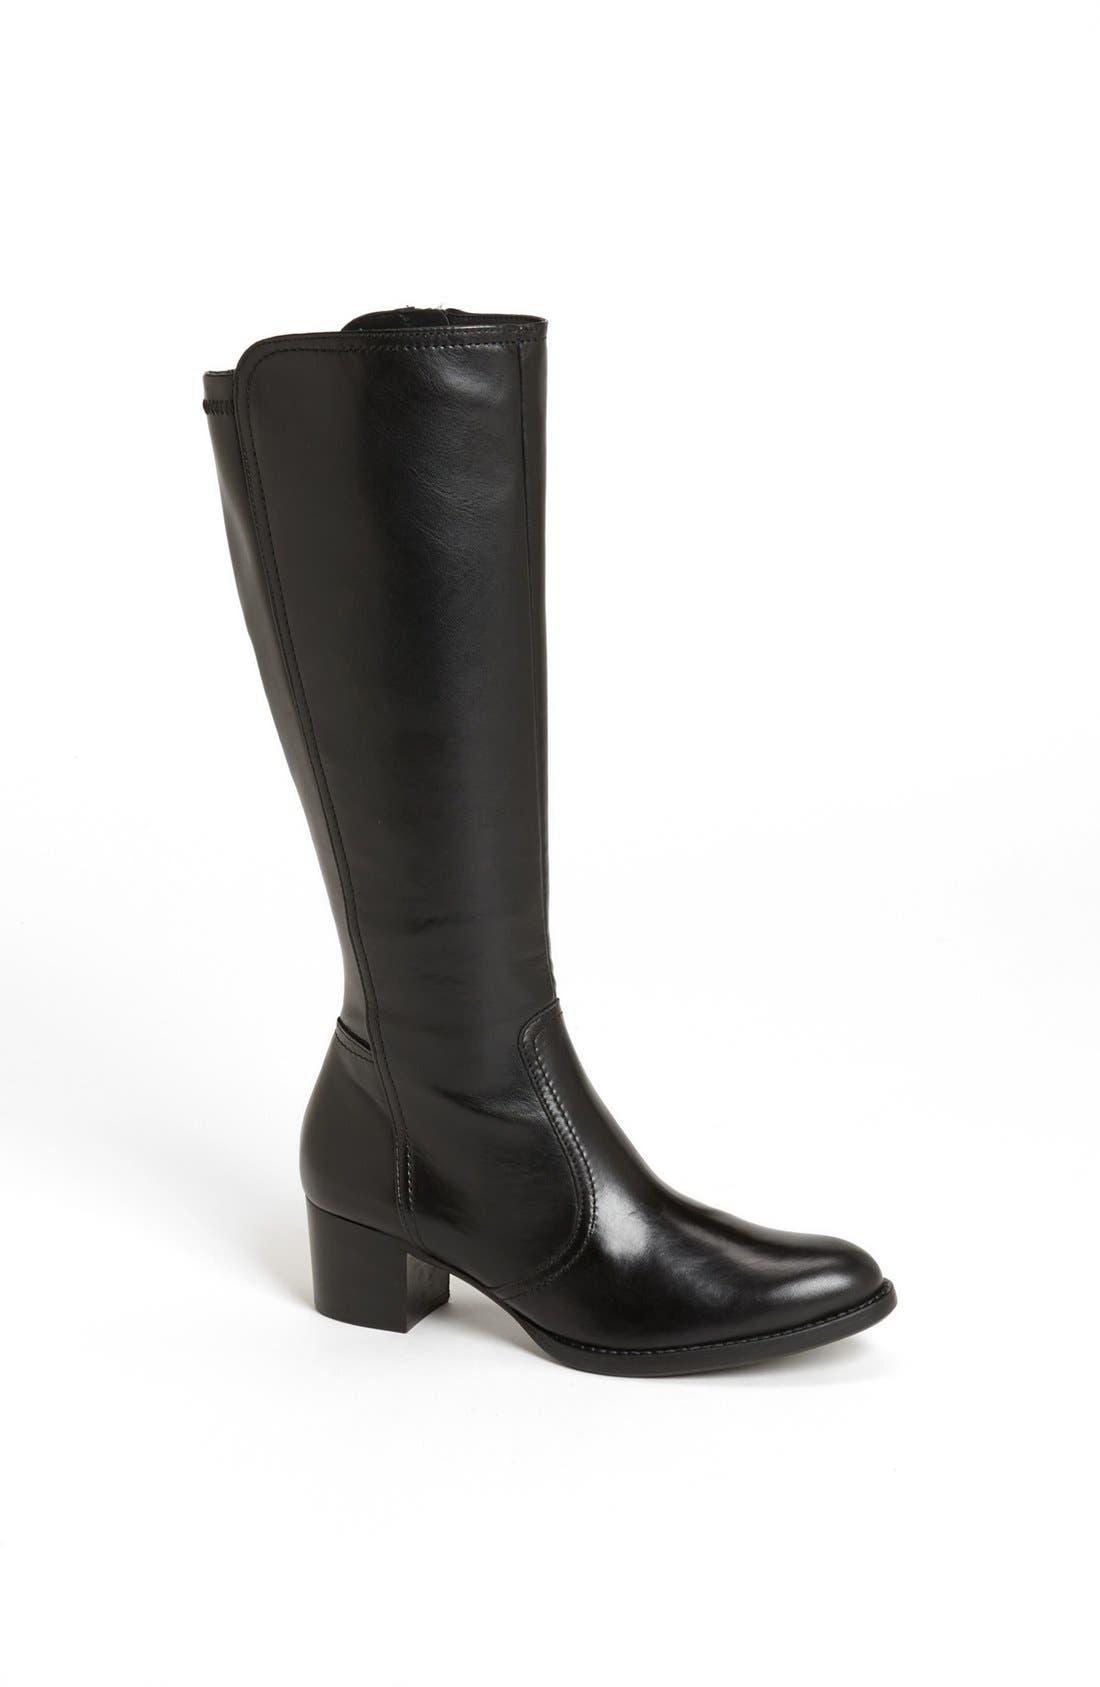 Alternate Image 1 Selected - Paul Green 'Sharon' Boot